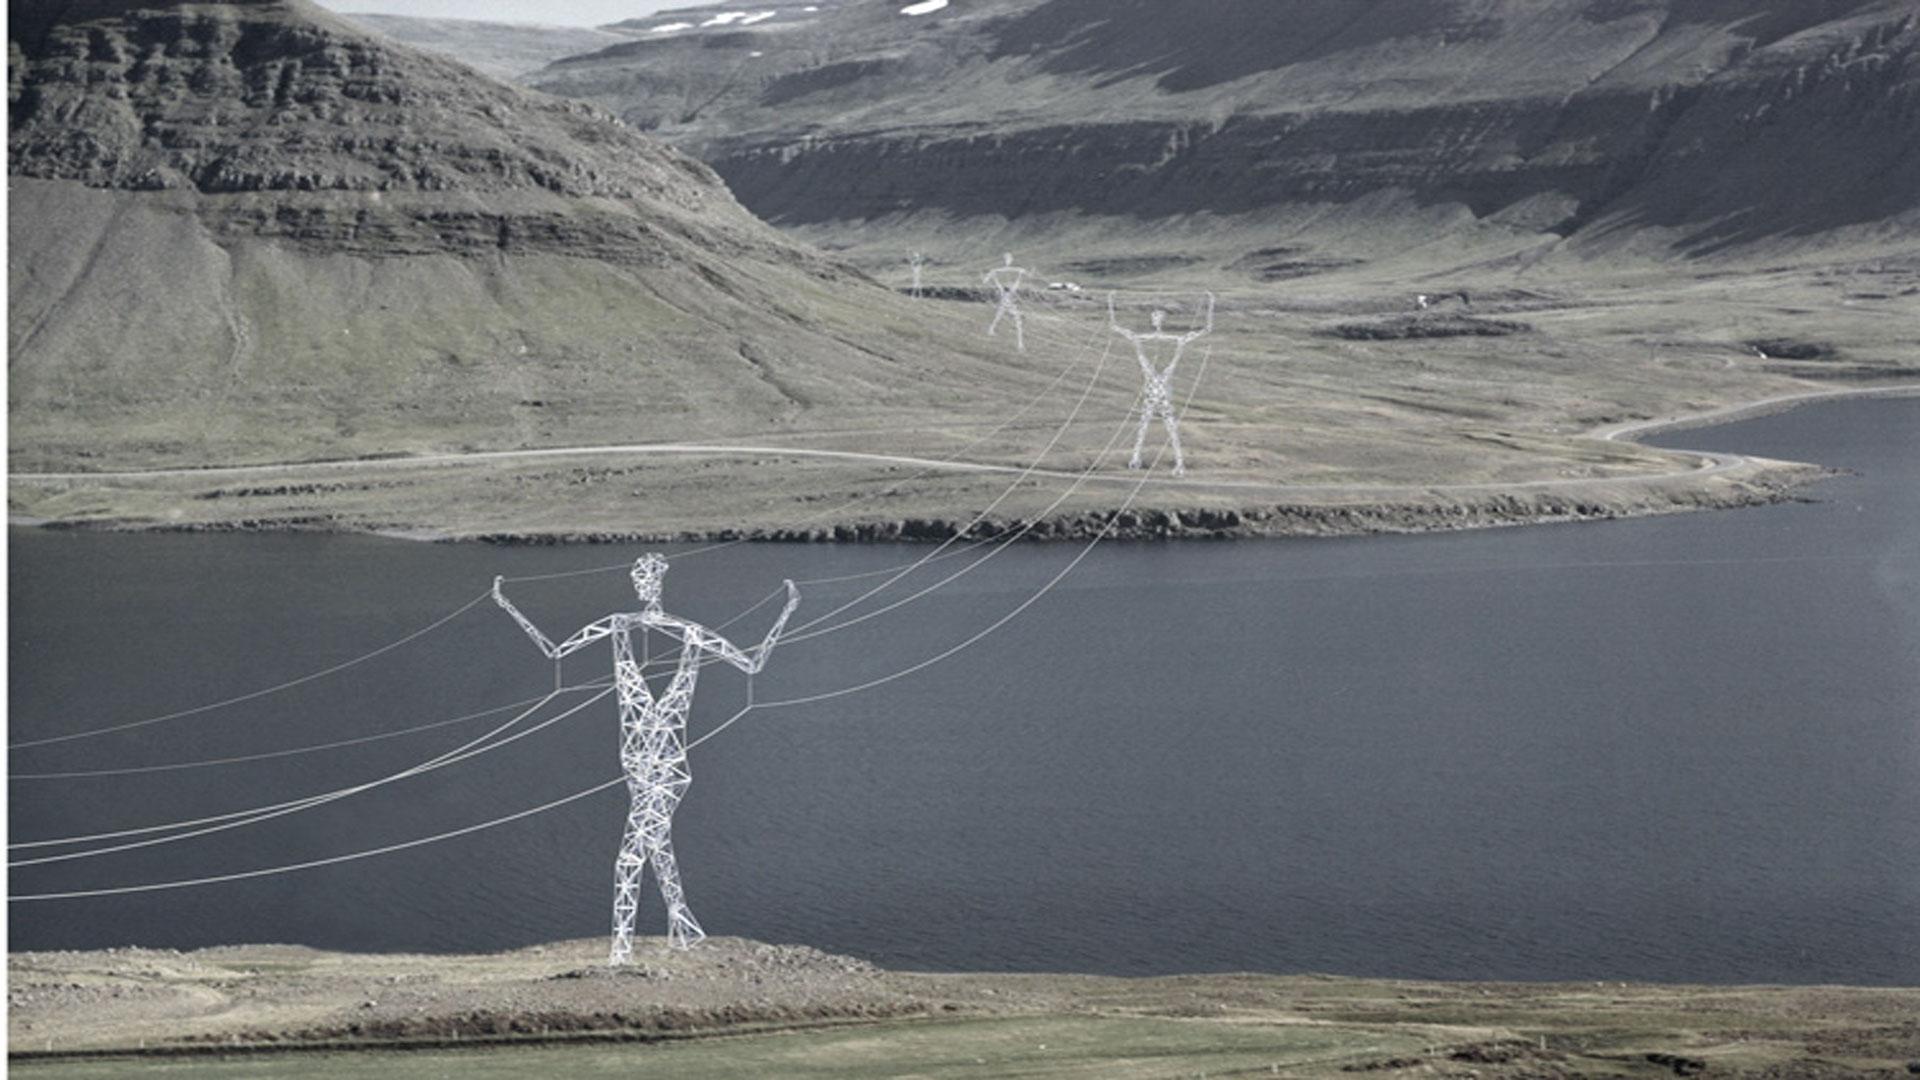 Tierra-de-gigantes-Islandia-1920